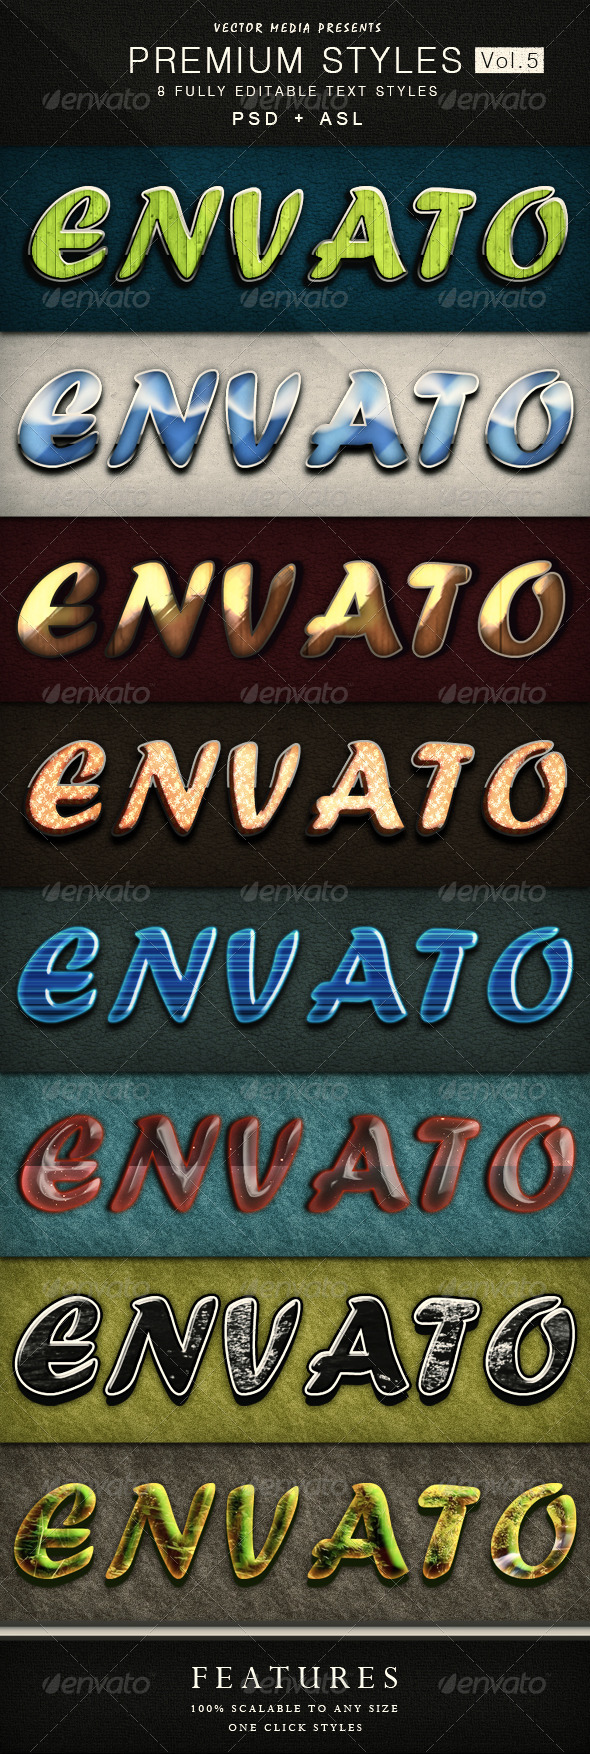 GraphicRiver Premium Text Styles Vol.5 4382228